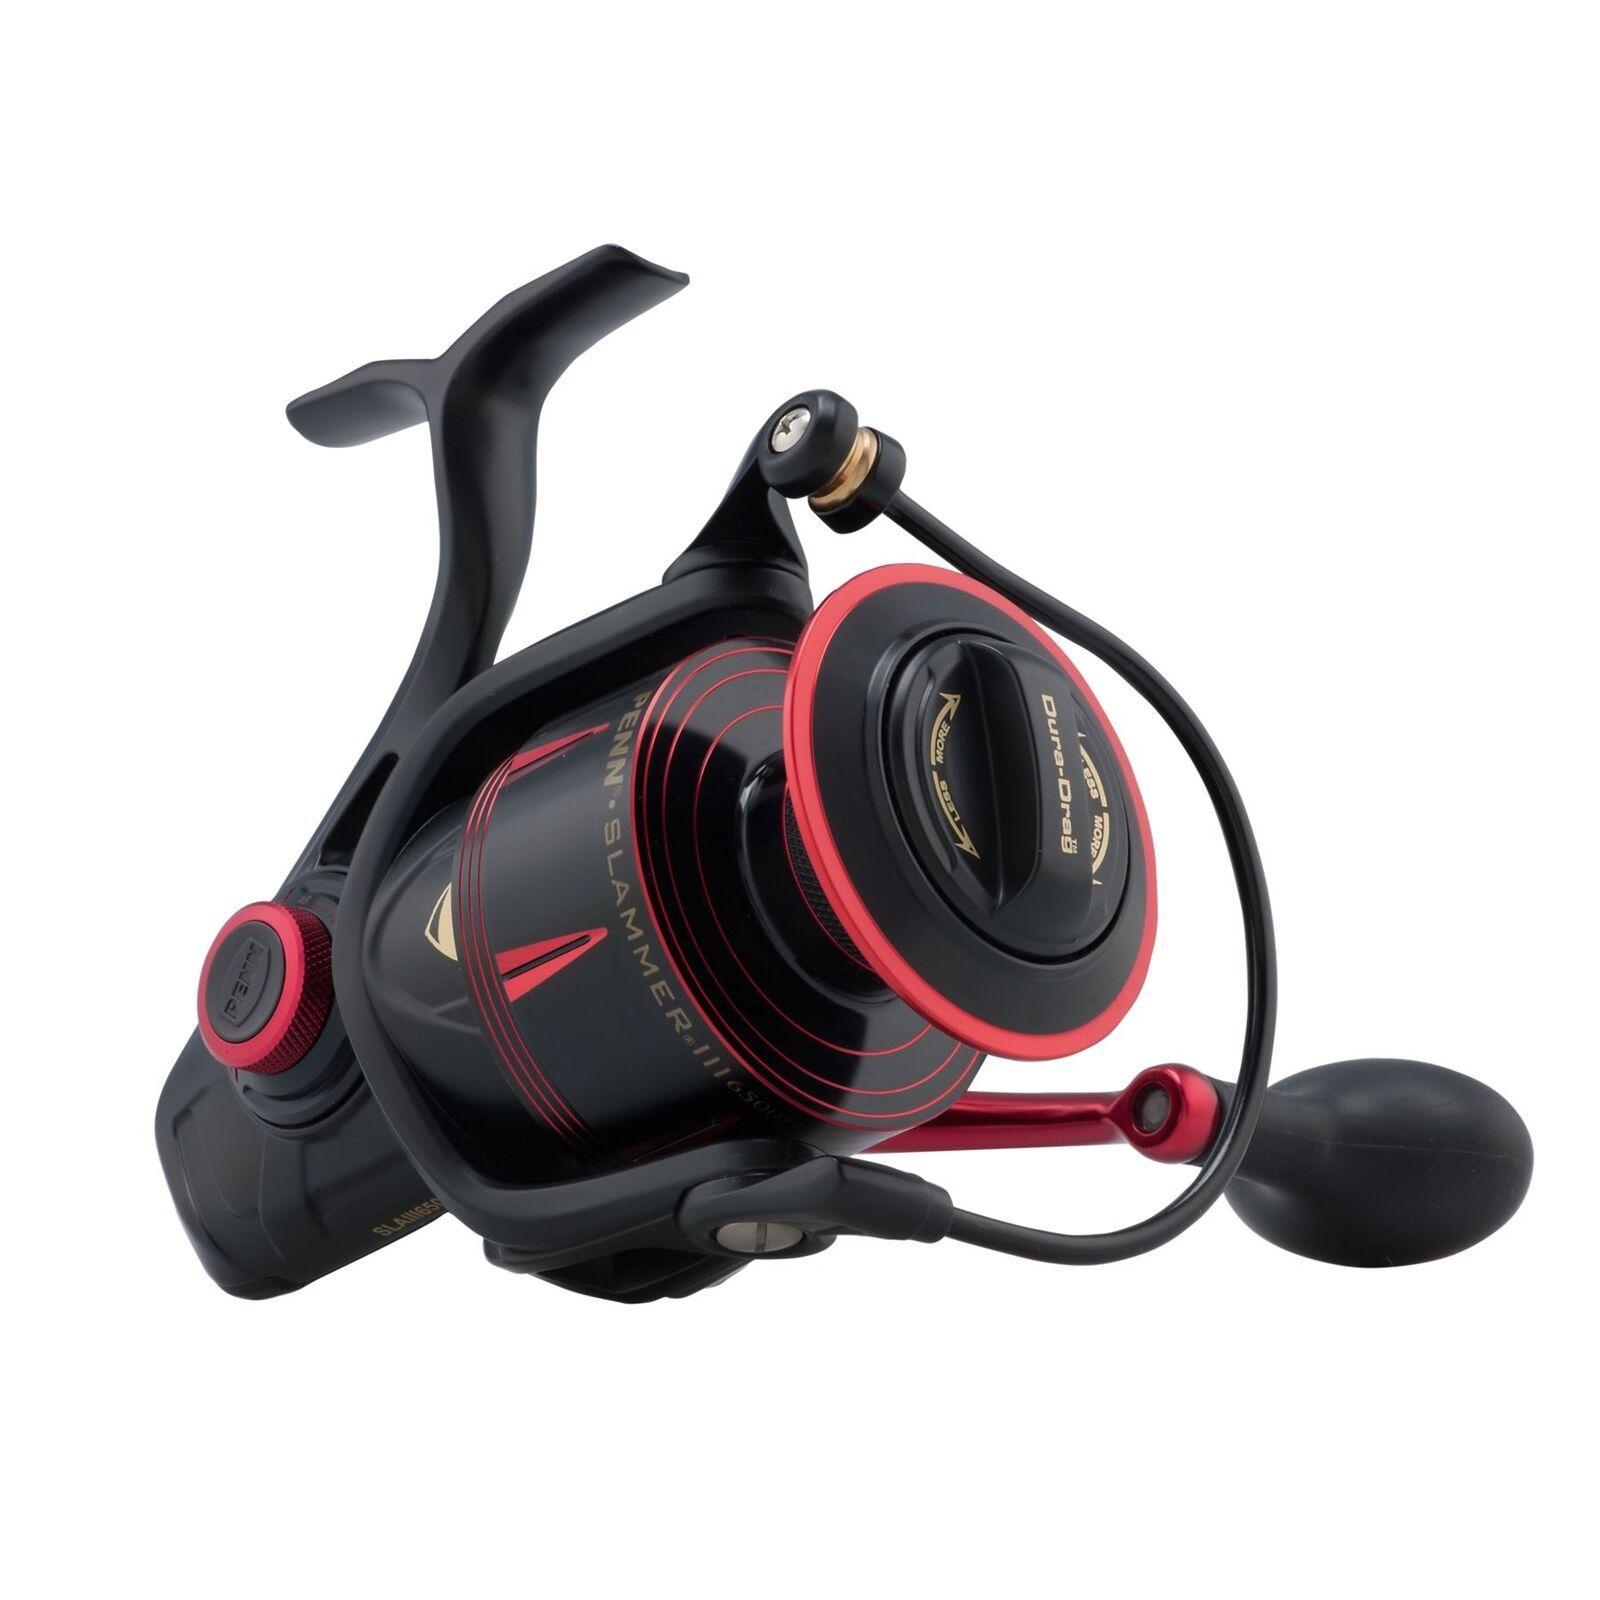 Penn Slammer III 6500 HS / Heavy Duty Spinning Fishing Reel